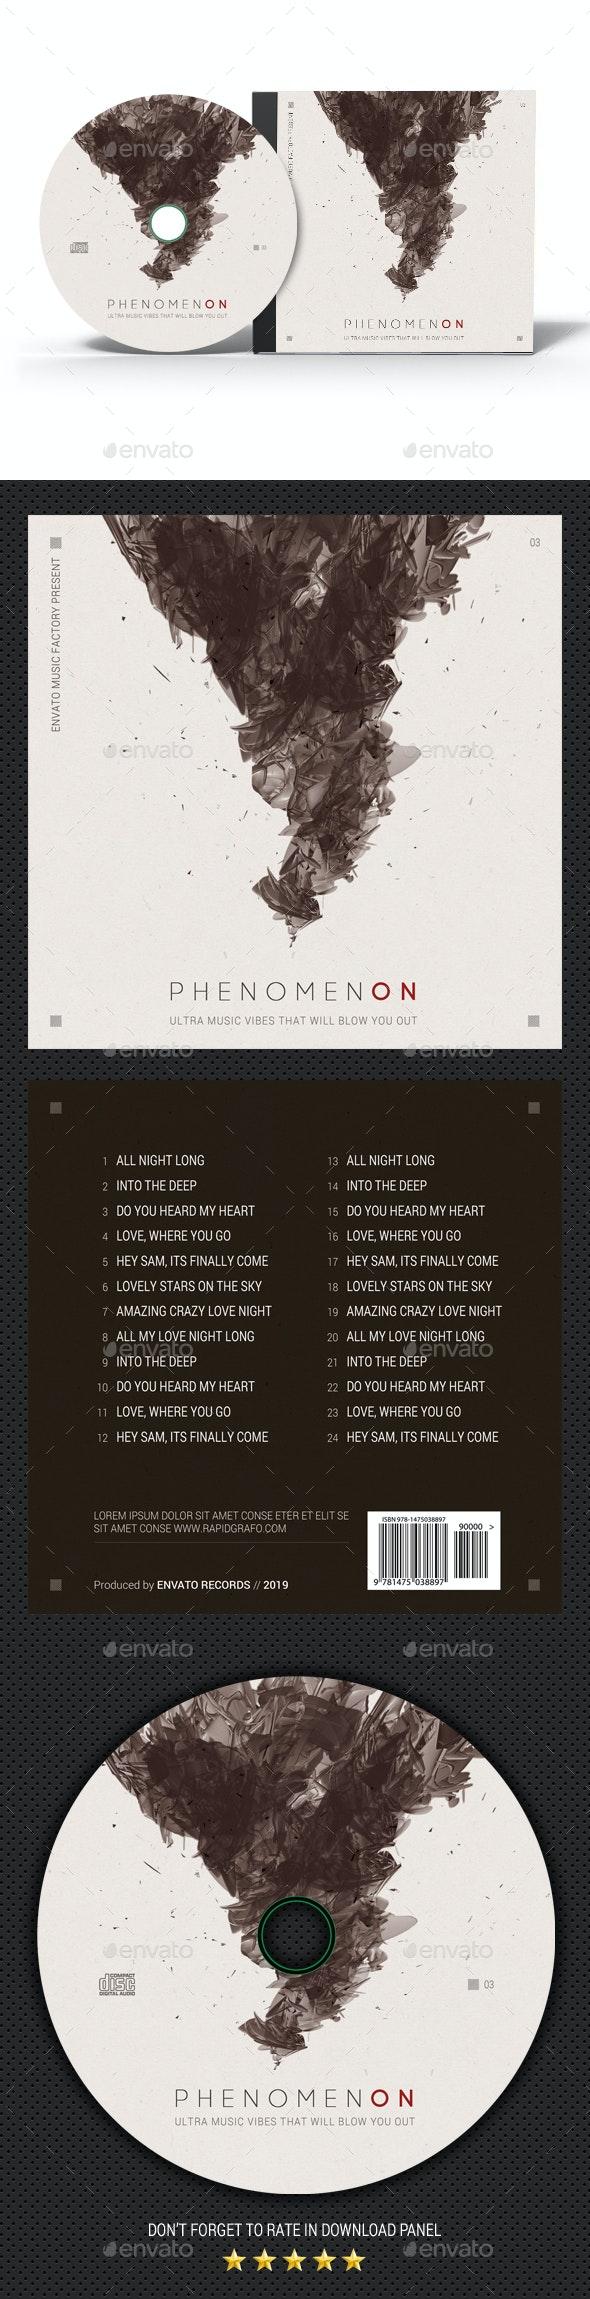 Phenomenon CD Cover - CD & DVD Artwork Print Templates